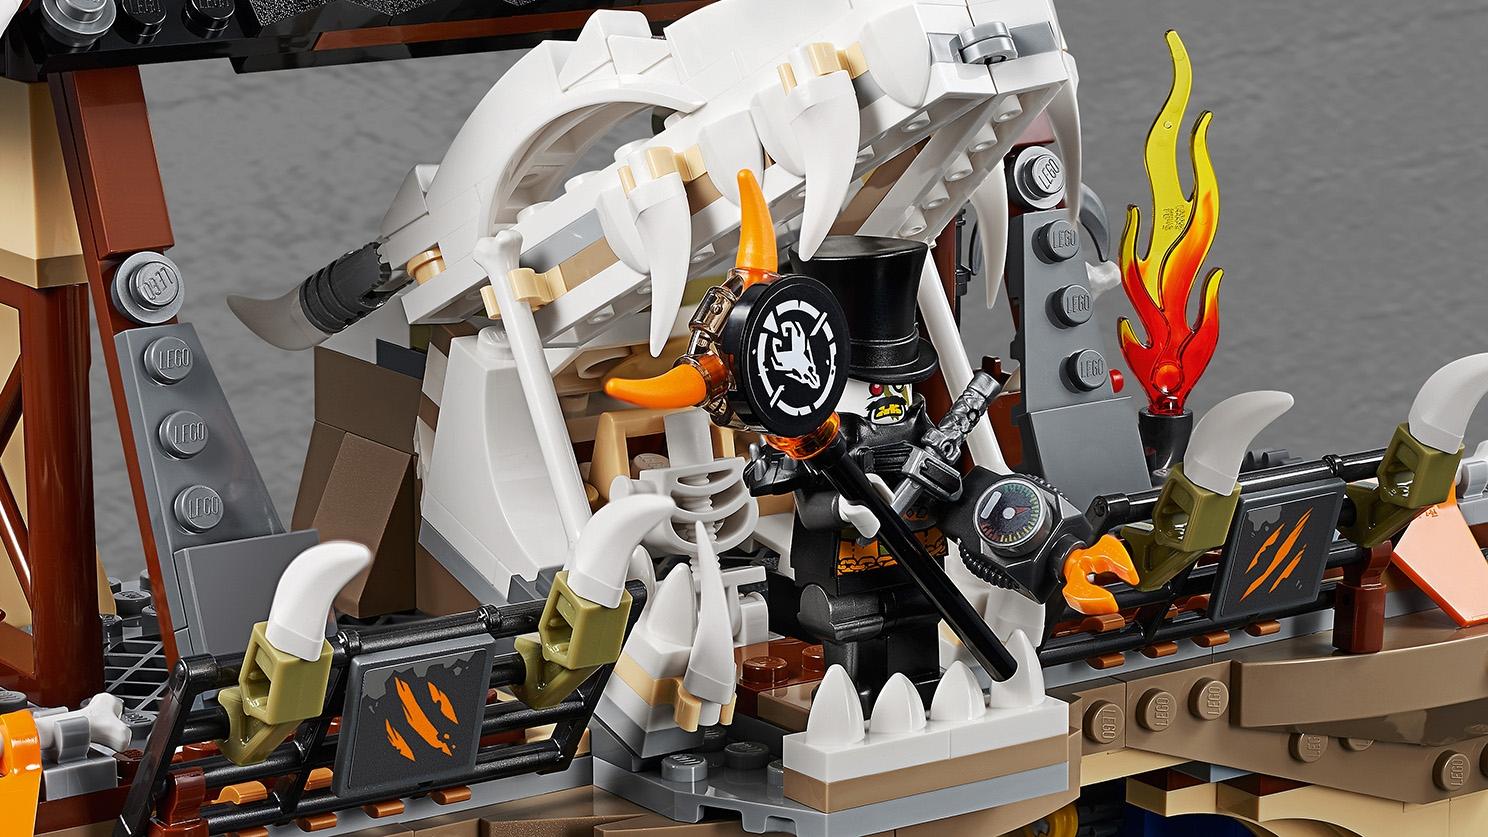 Lego Ninjago Dragon Armor / Shop with afterpay on eligible items.